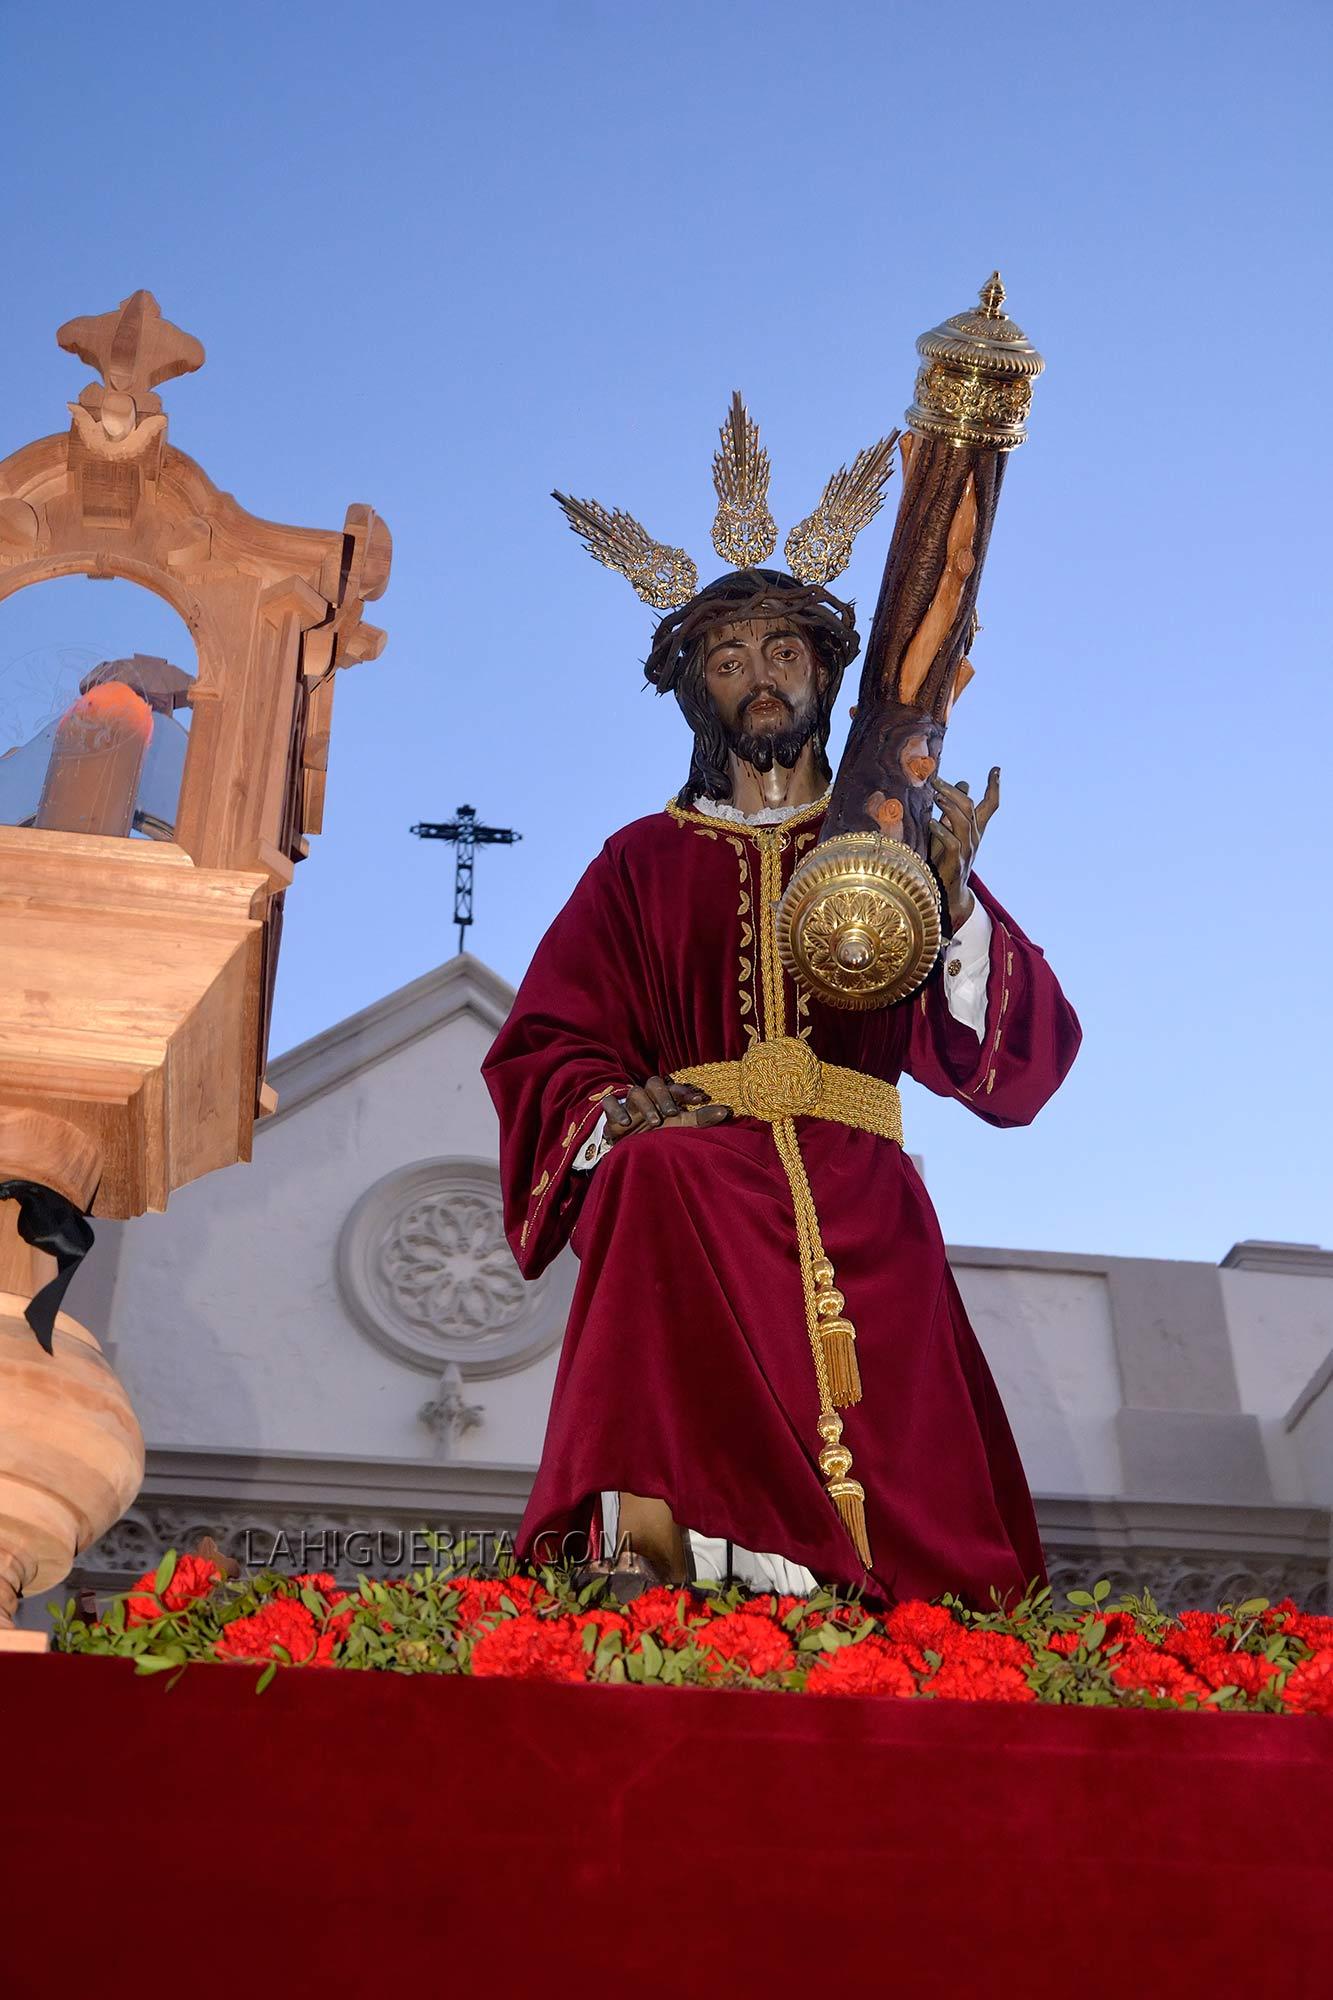 Cristo de las tres caidas